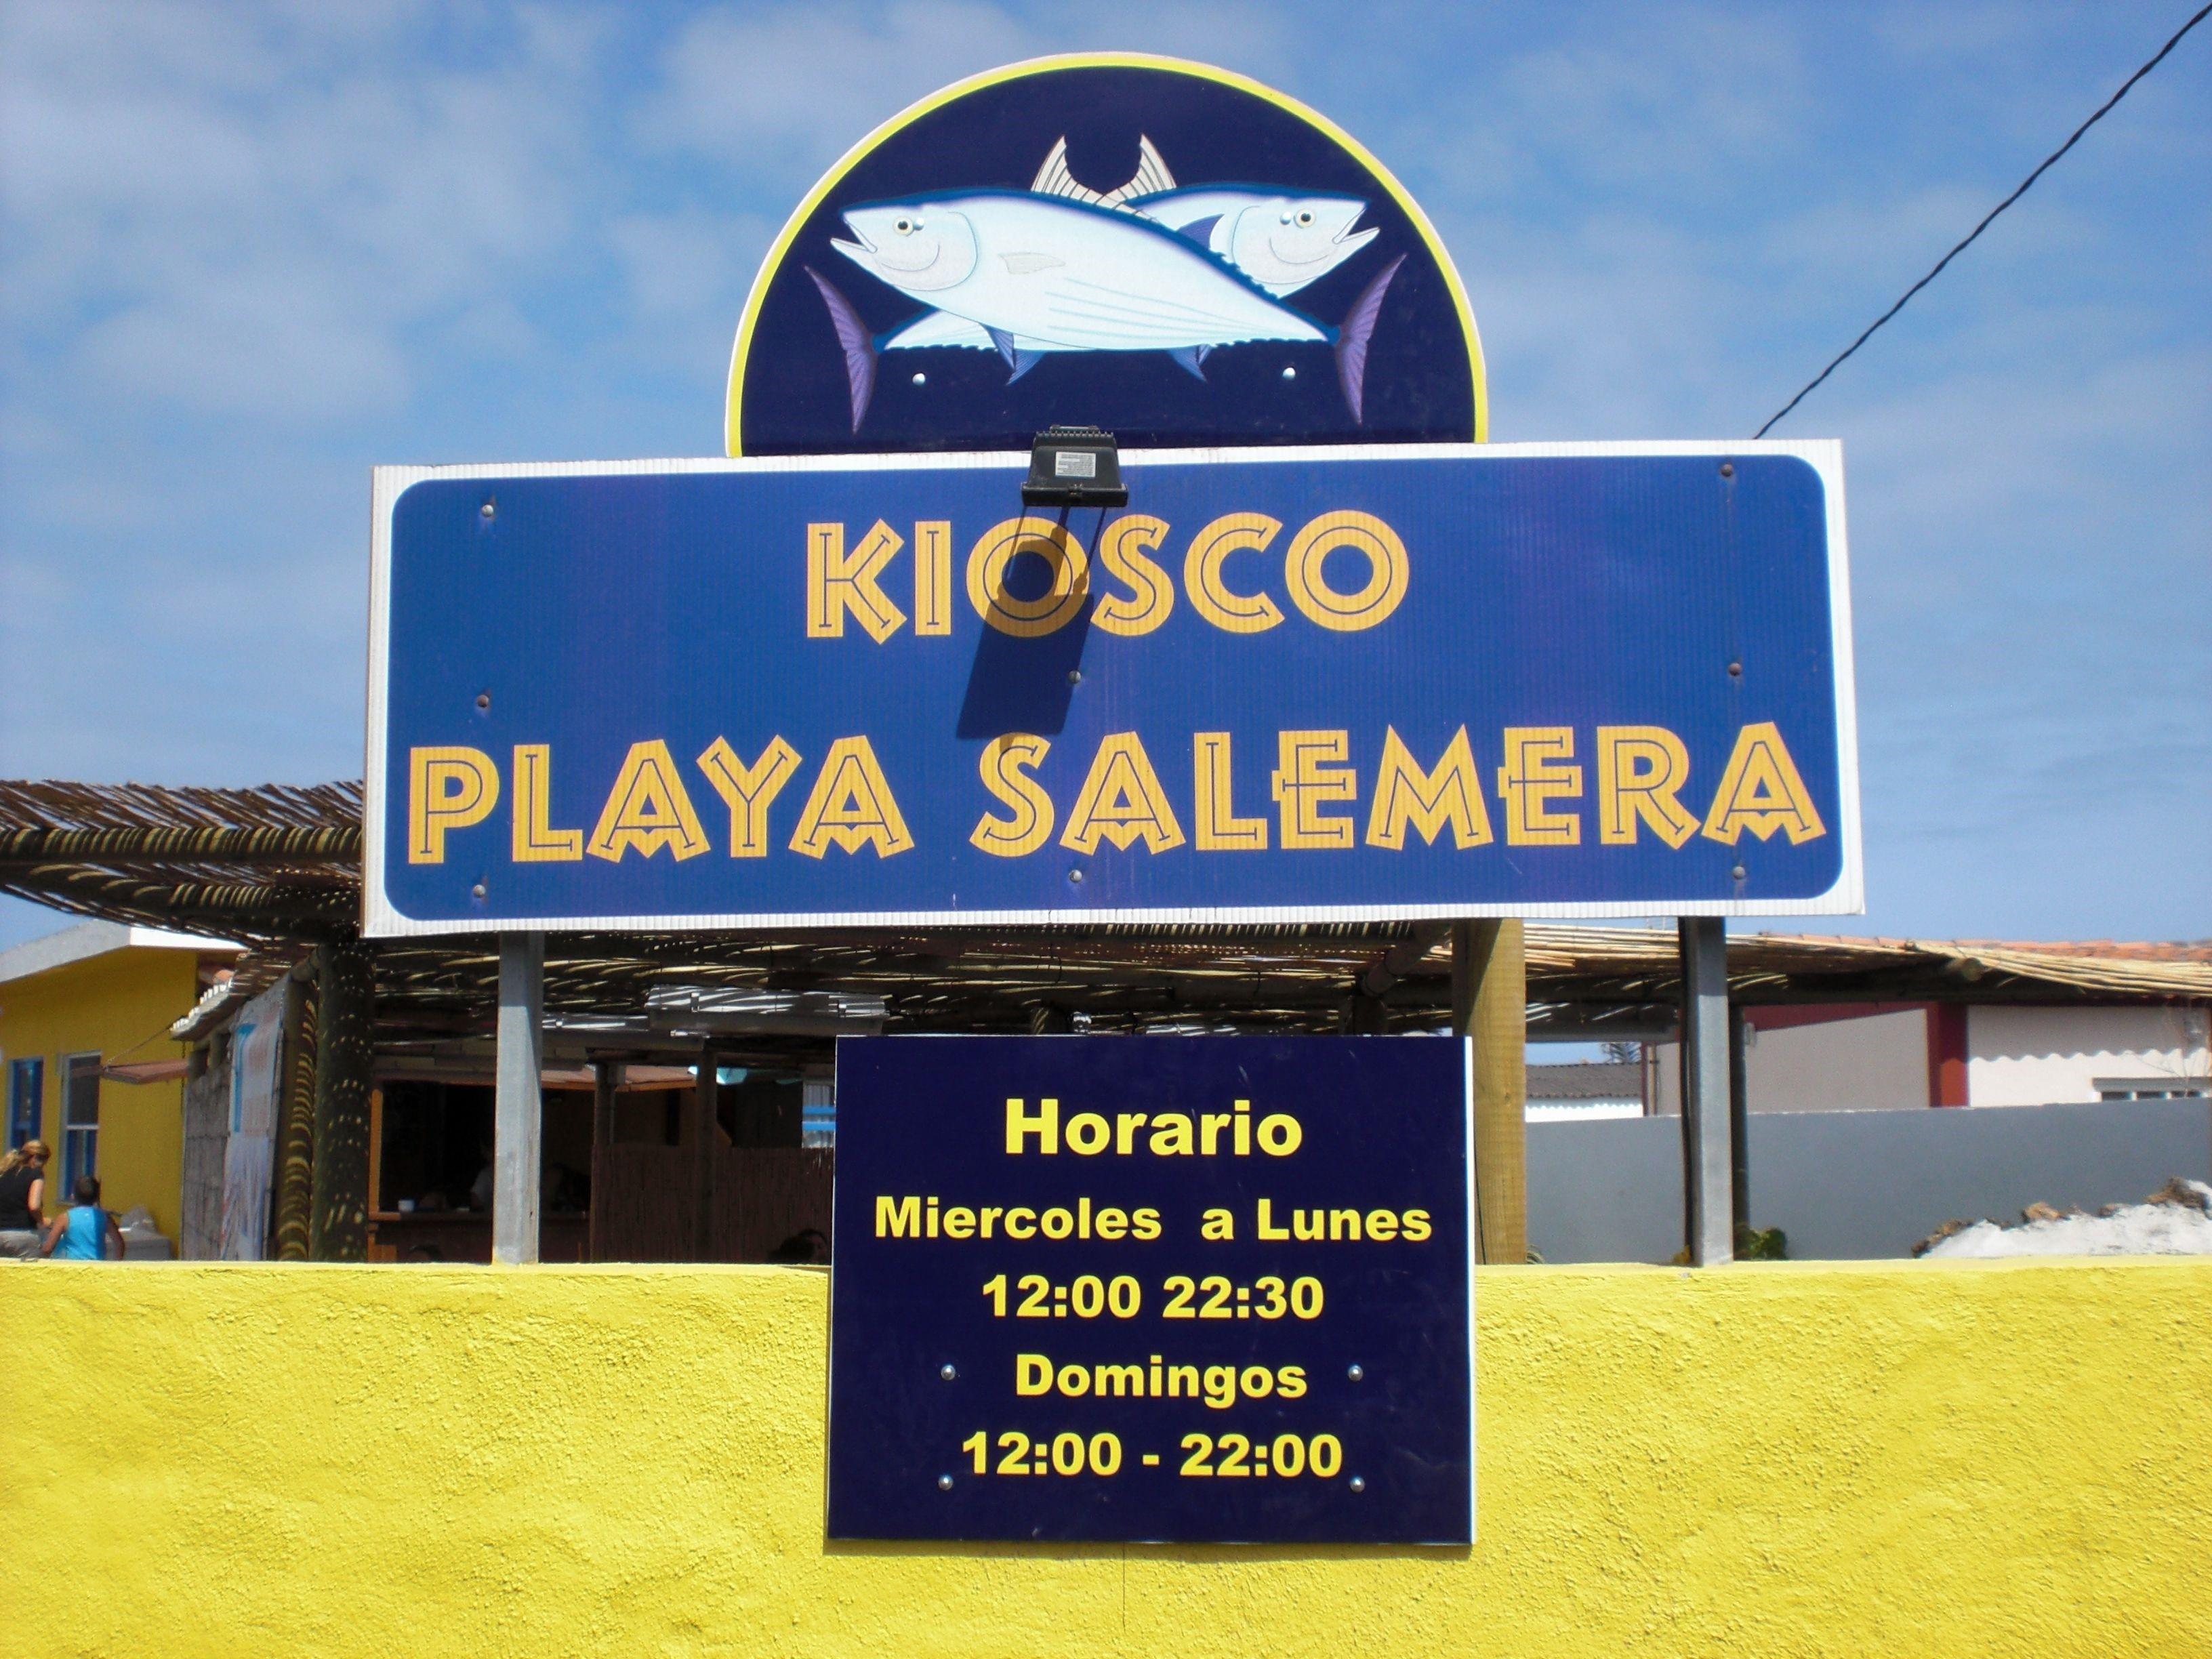 Kiosco Playa Salemera